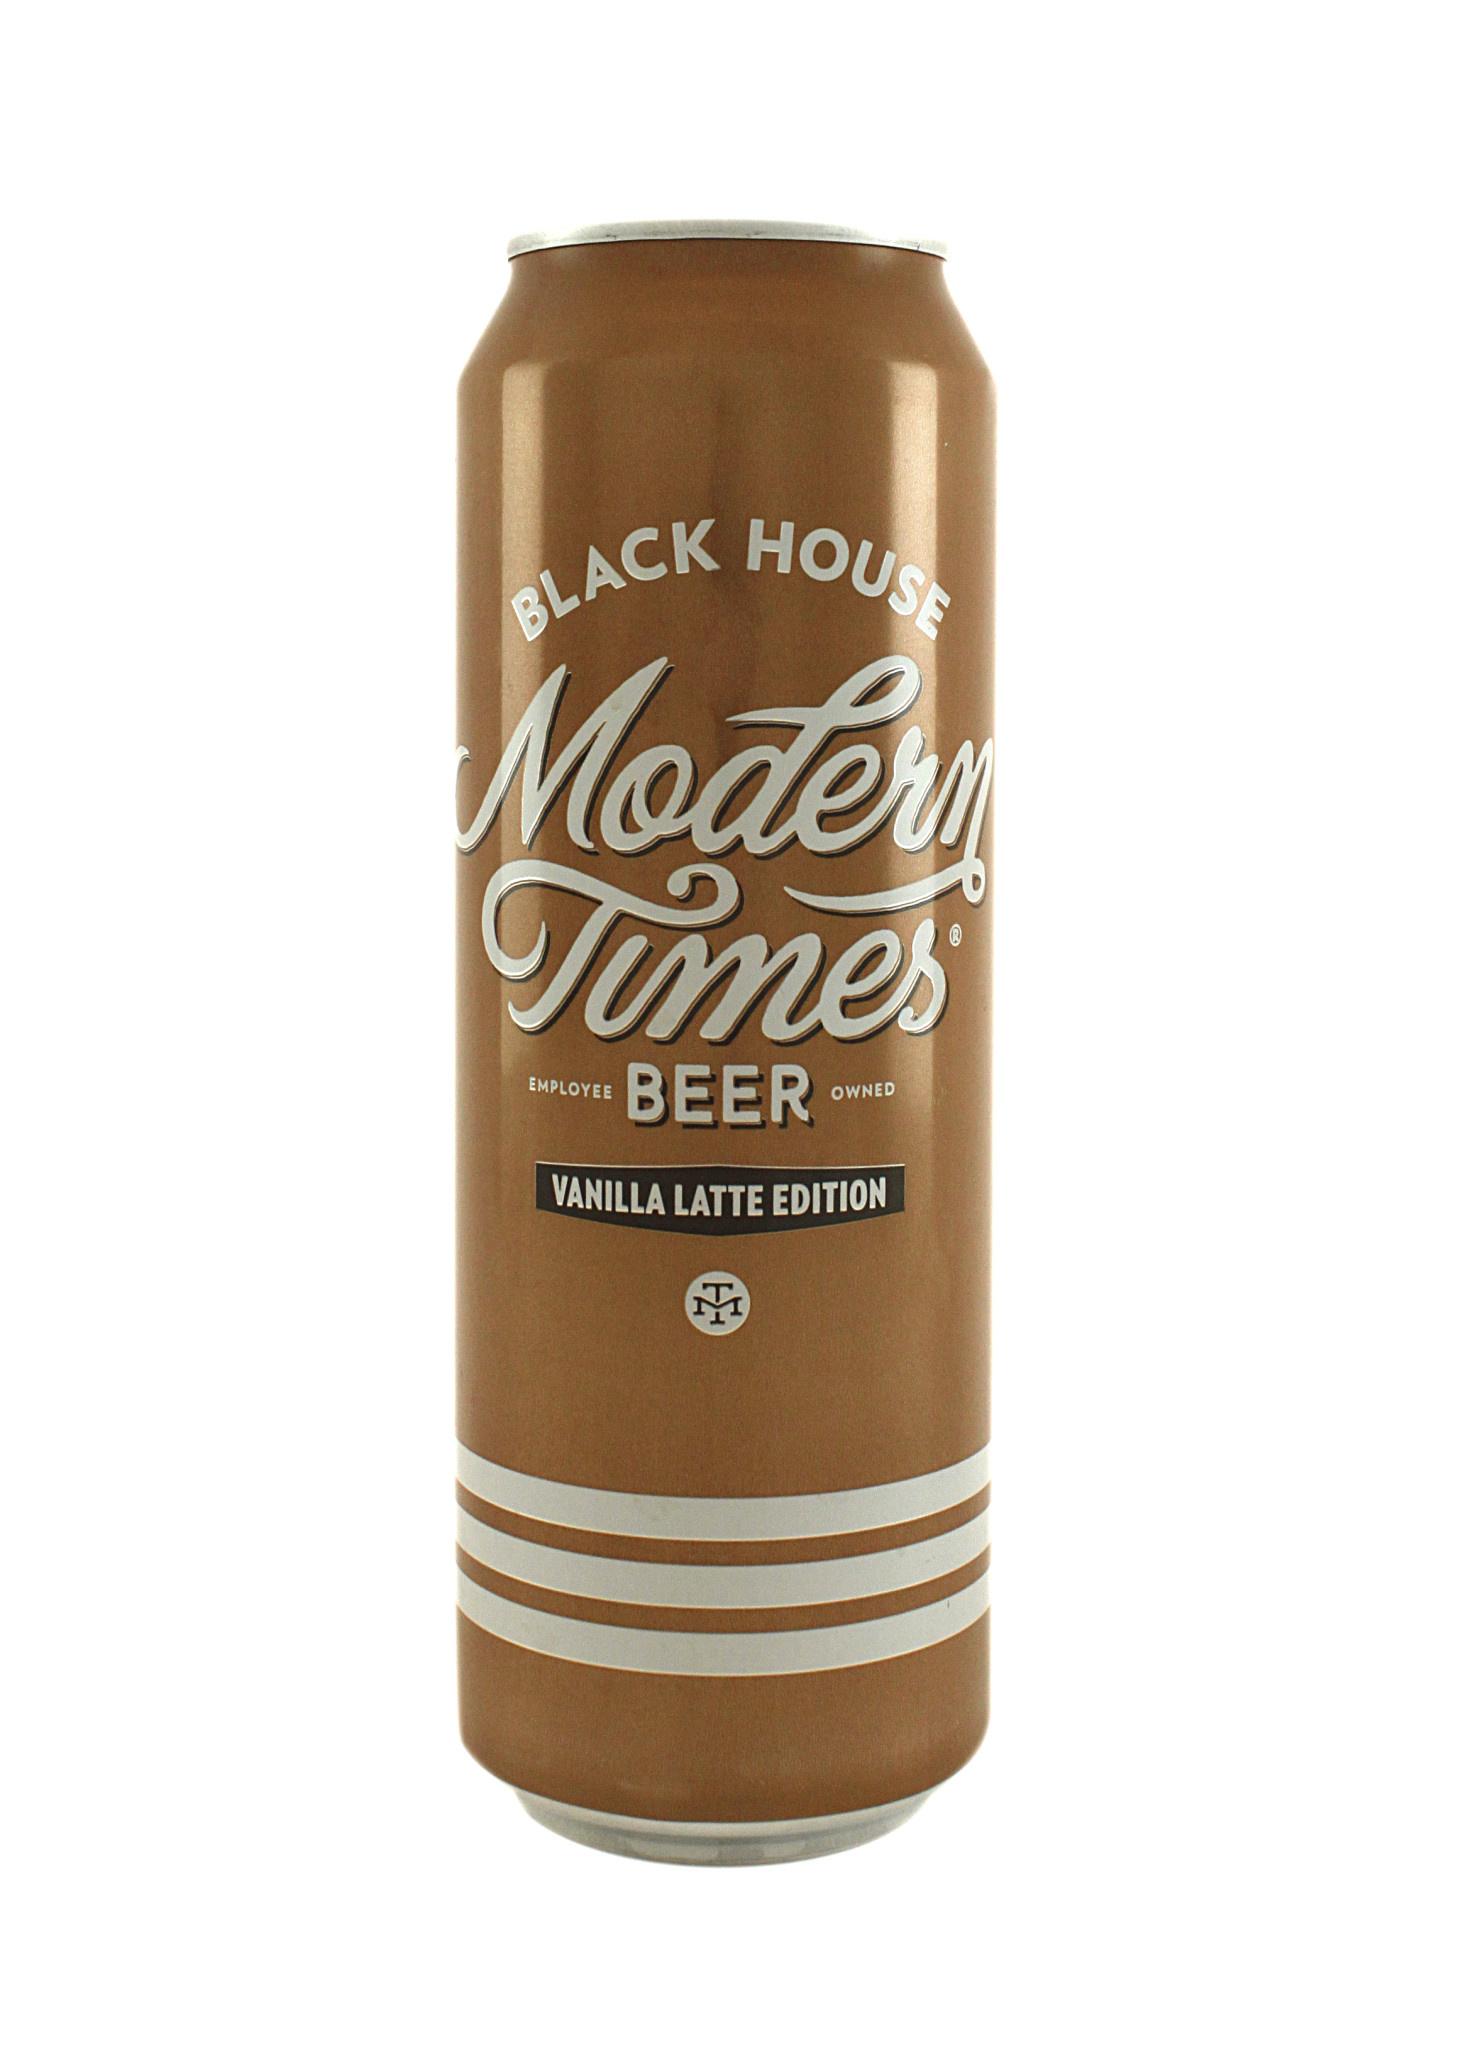 "Modern Times Beer Black House ""Vanilla Latte Edition""  19.2oz. Can - San Diego, CA"